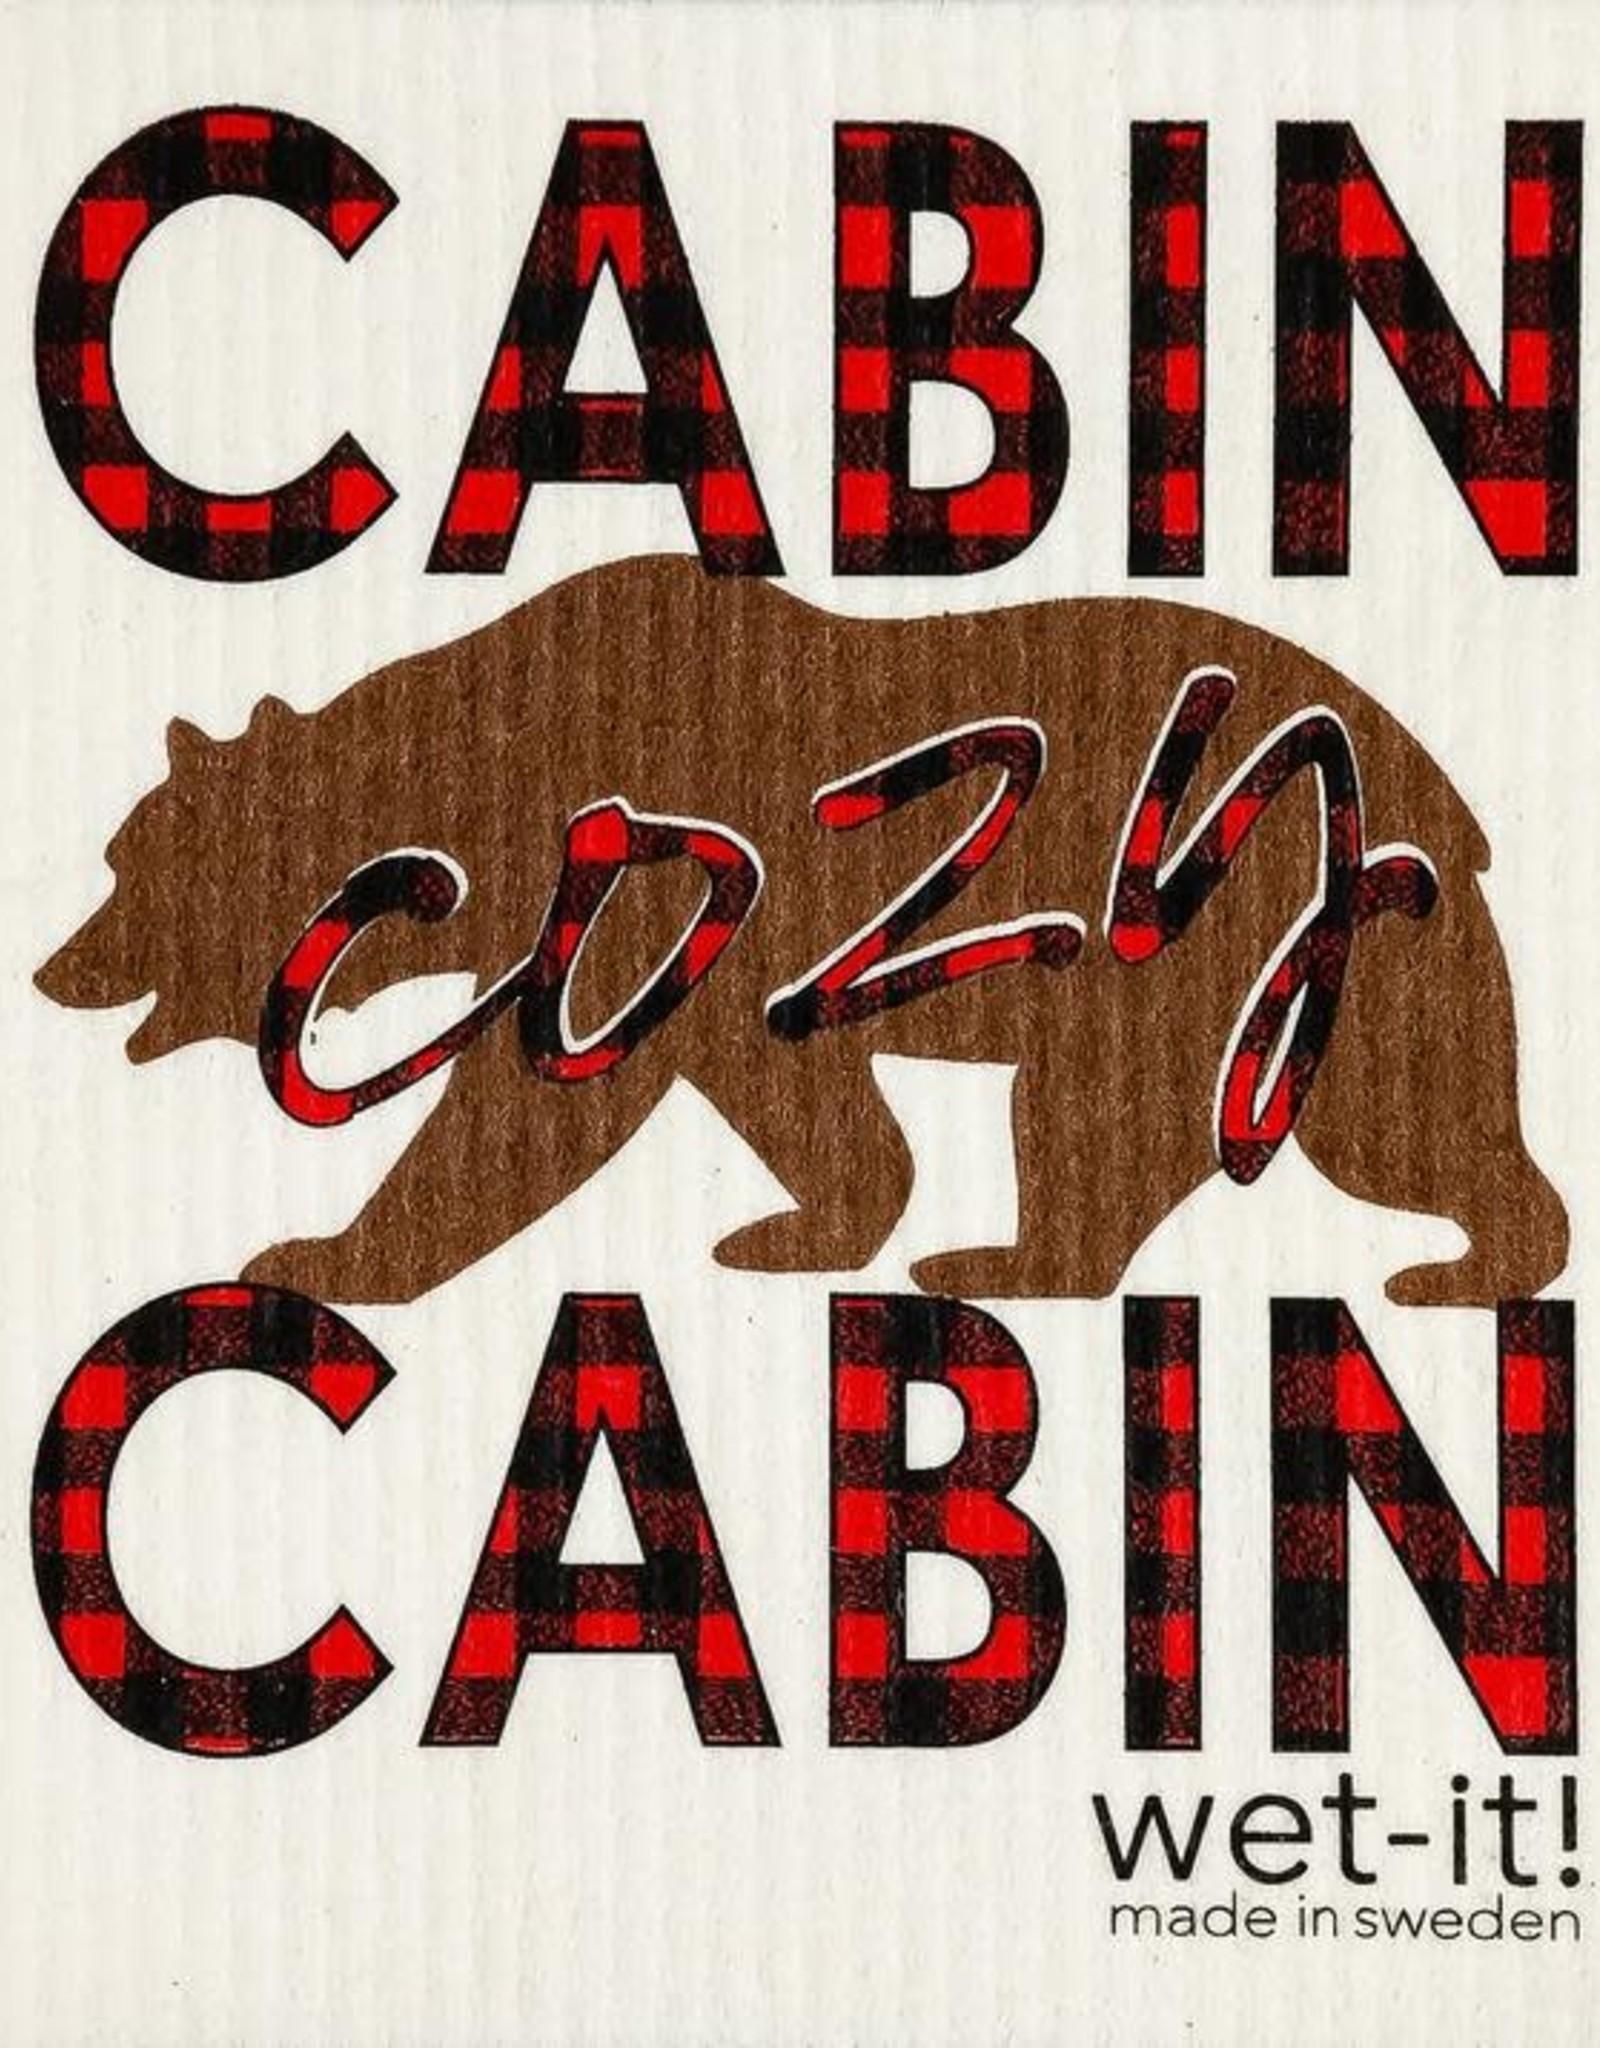 - Cabin Cozy Wet-it Cloth